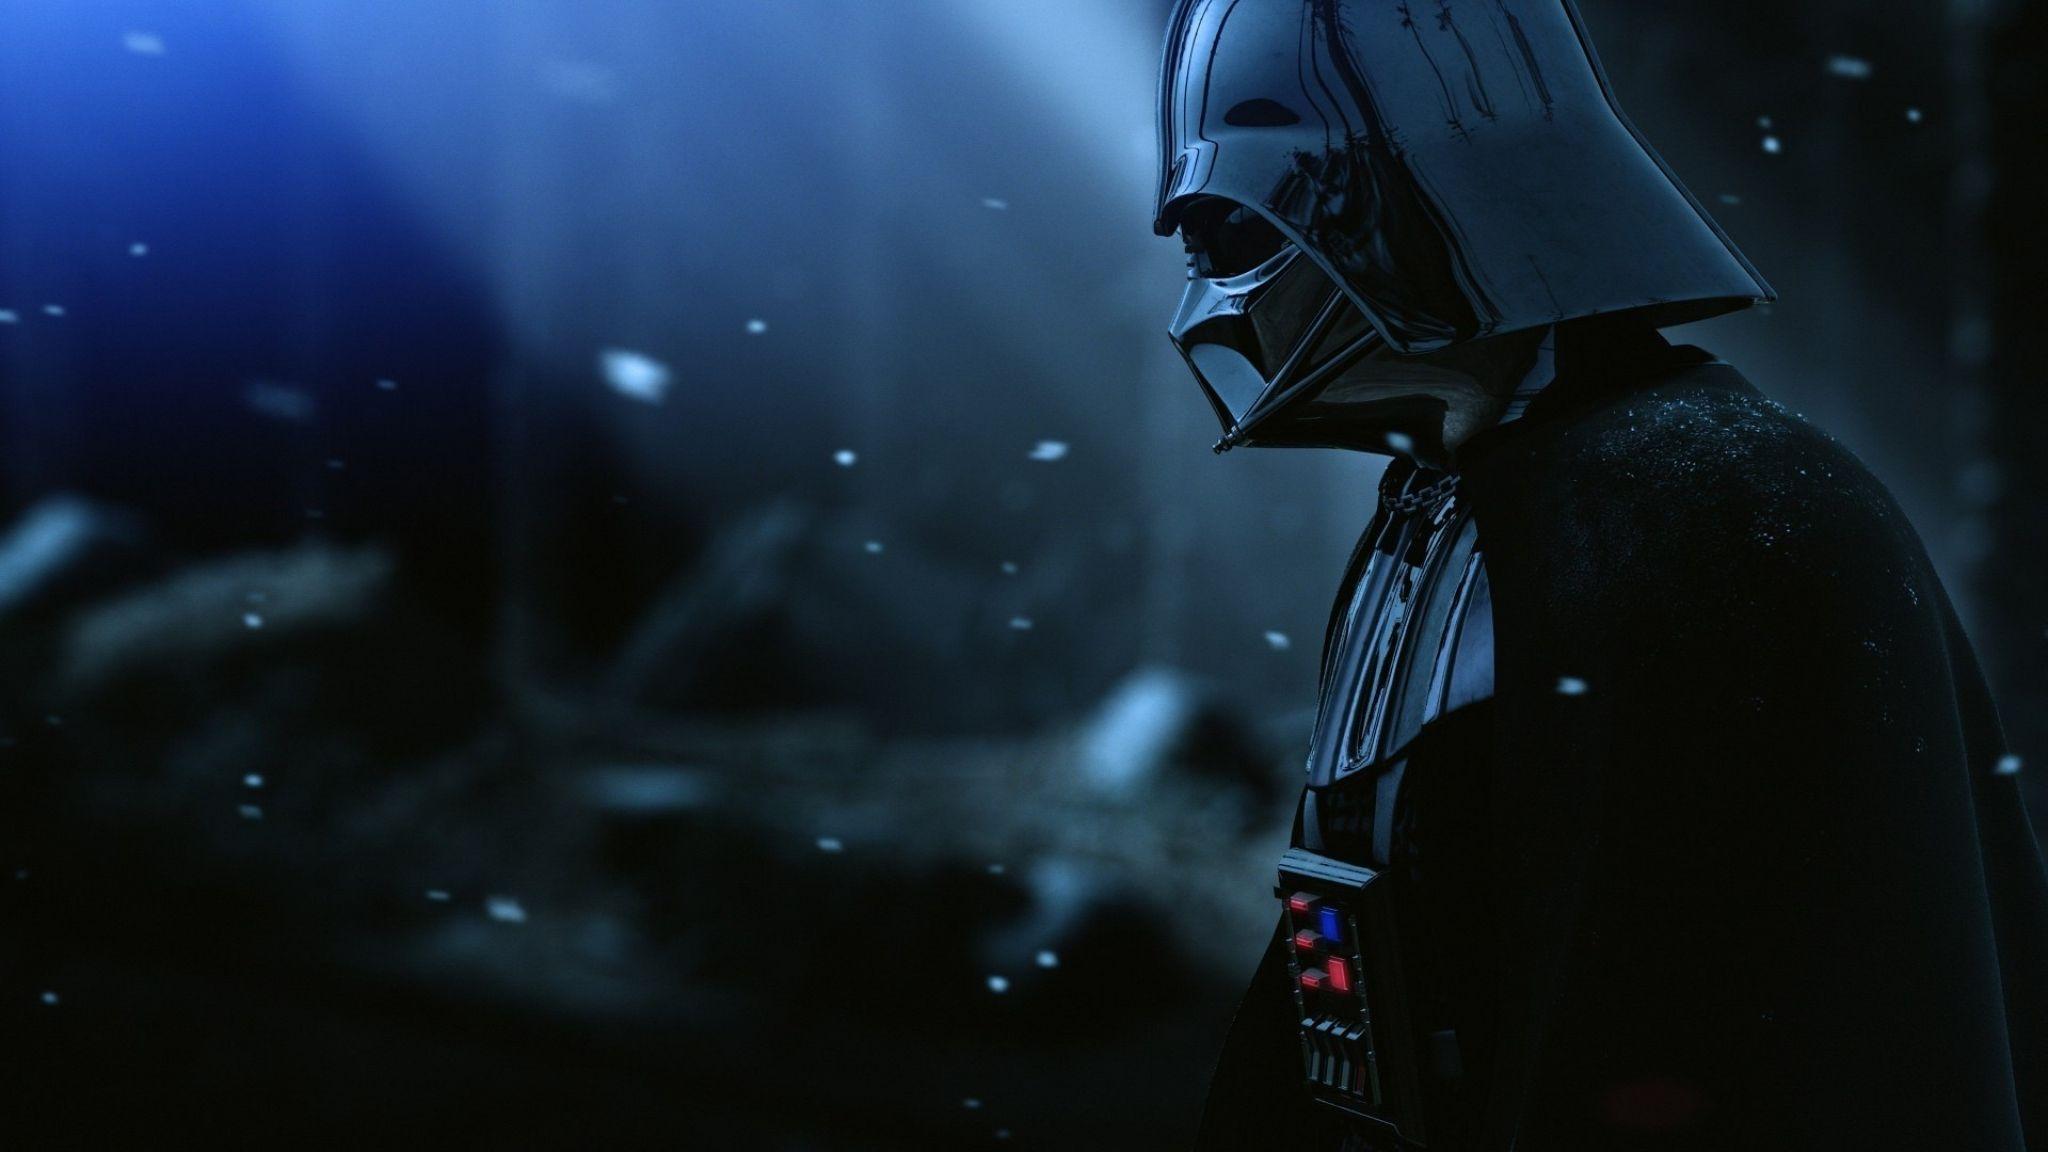 Darth Vader Free Screensaver Wallpapers Star Wars Background Darth Vader Wallpaper Star Wars Wallpaper